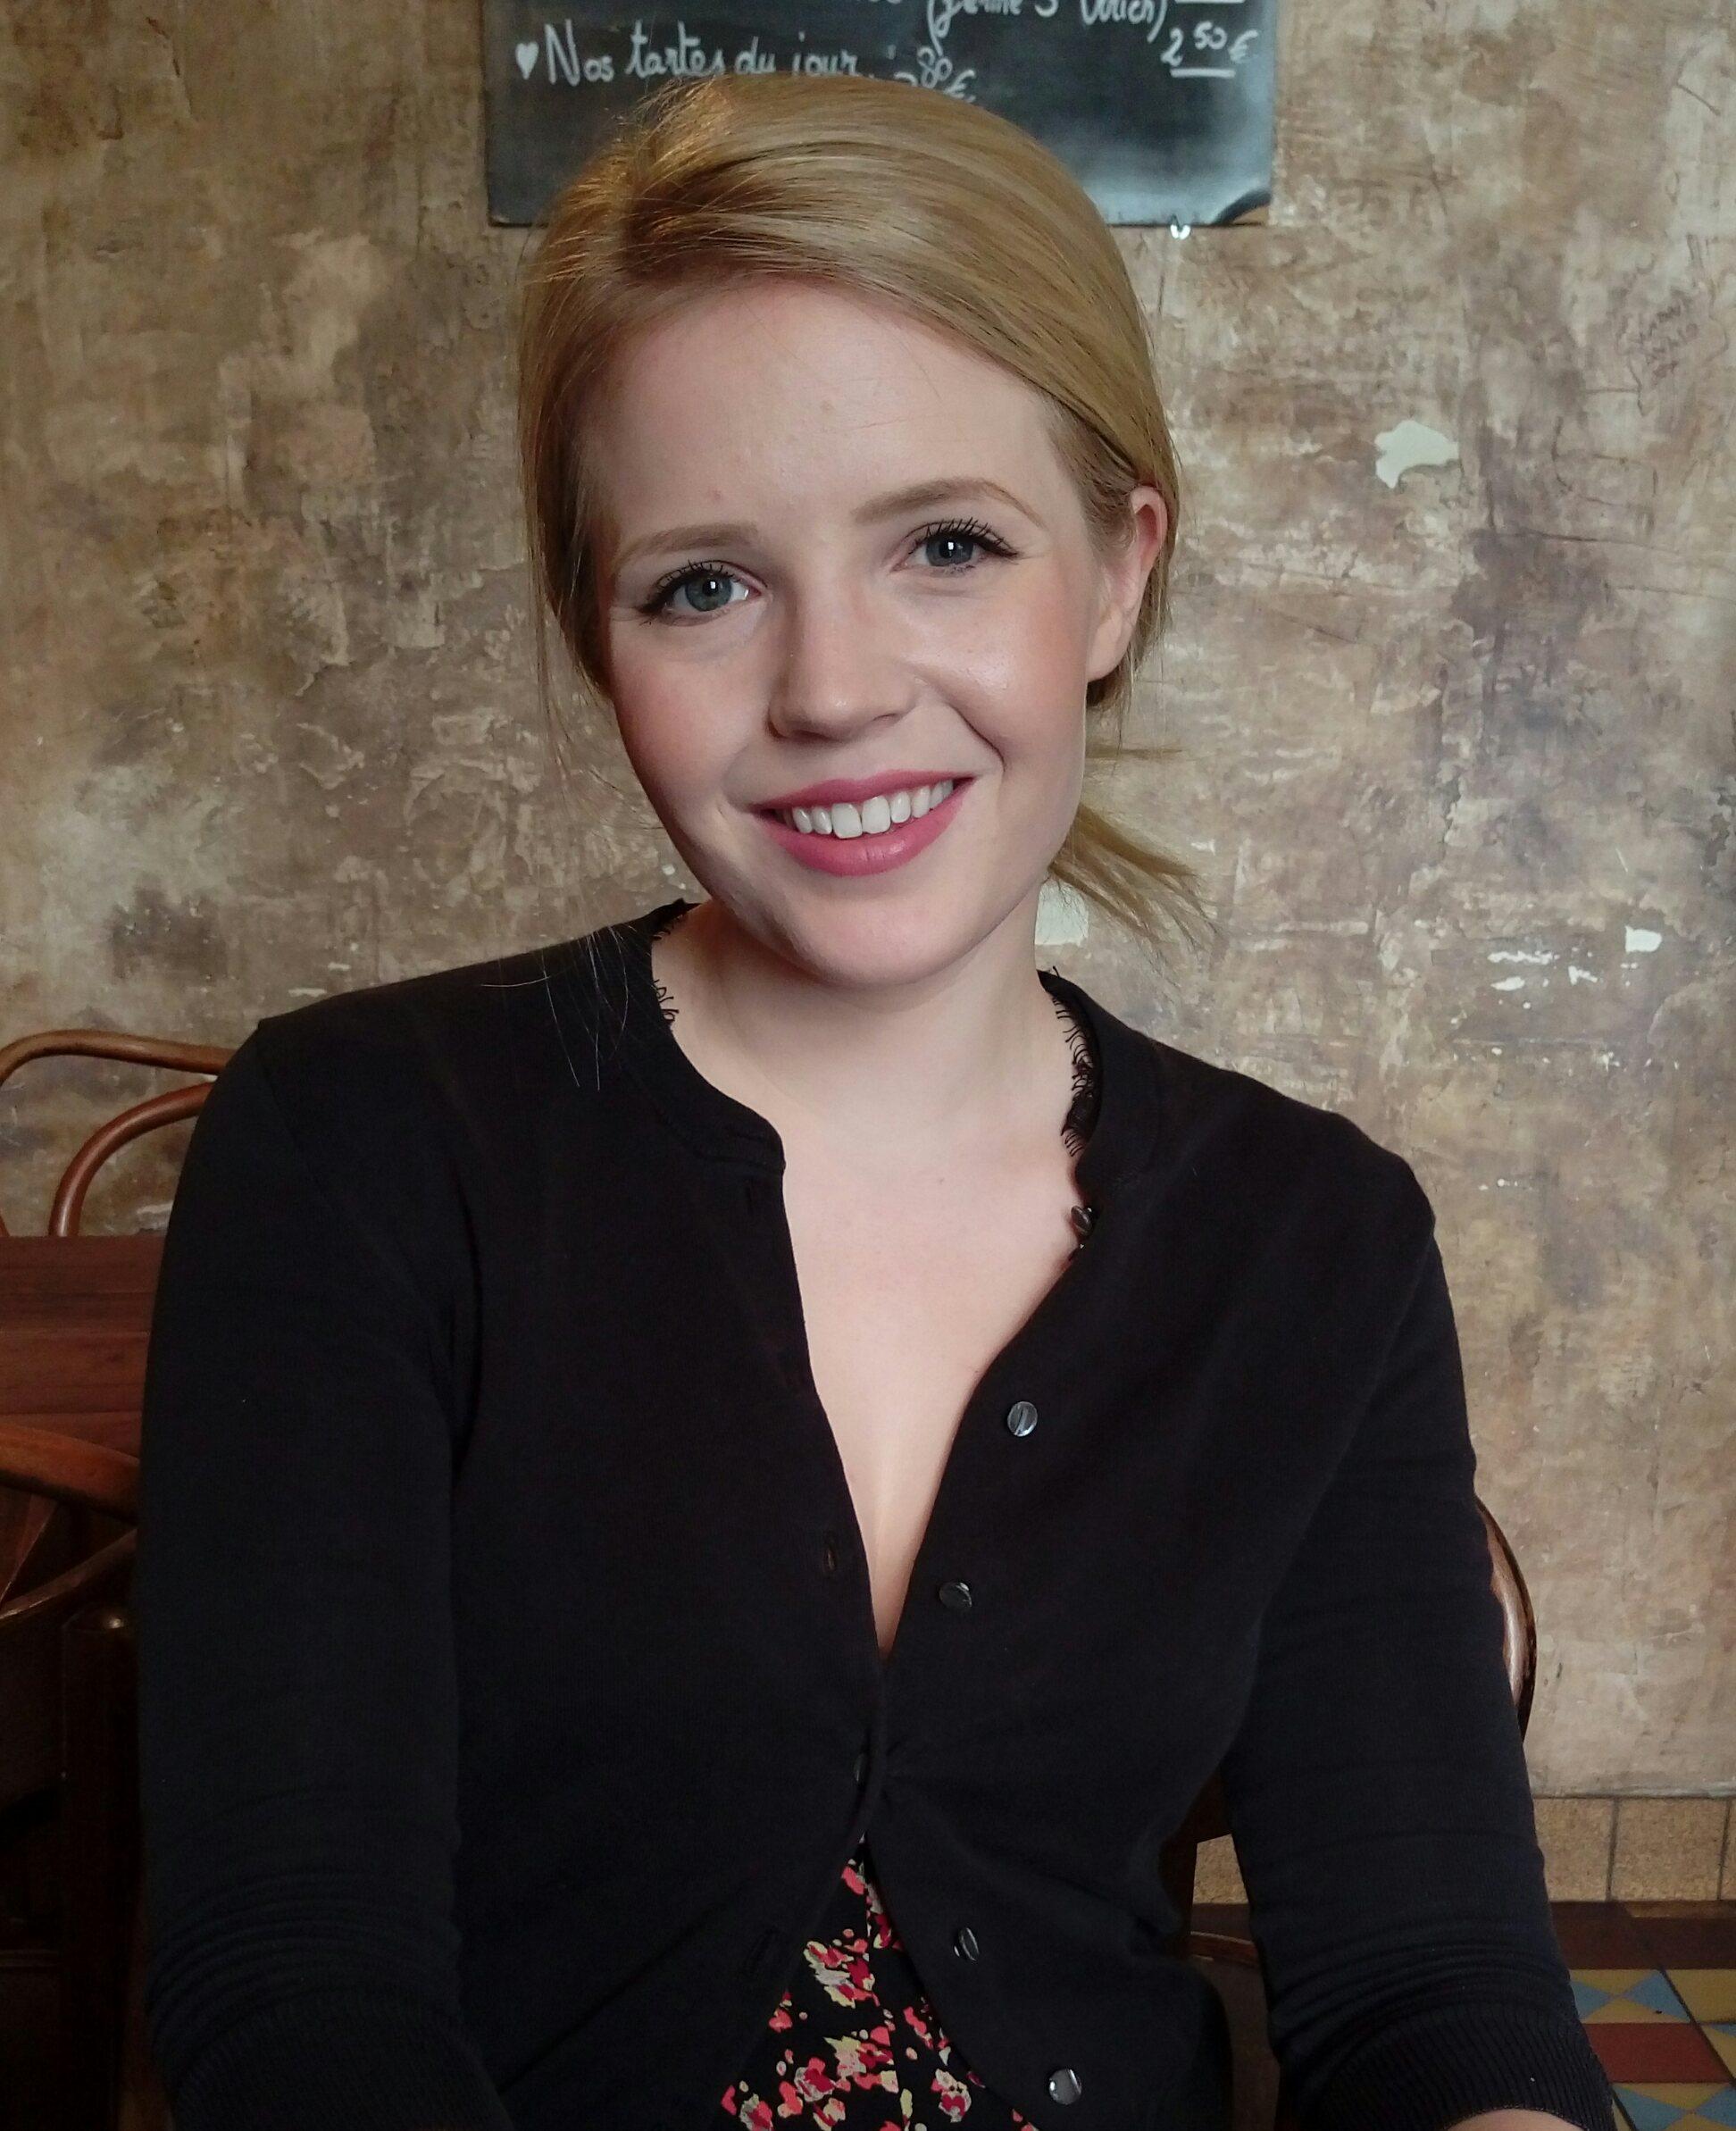 Holly Theisen-Jones